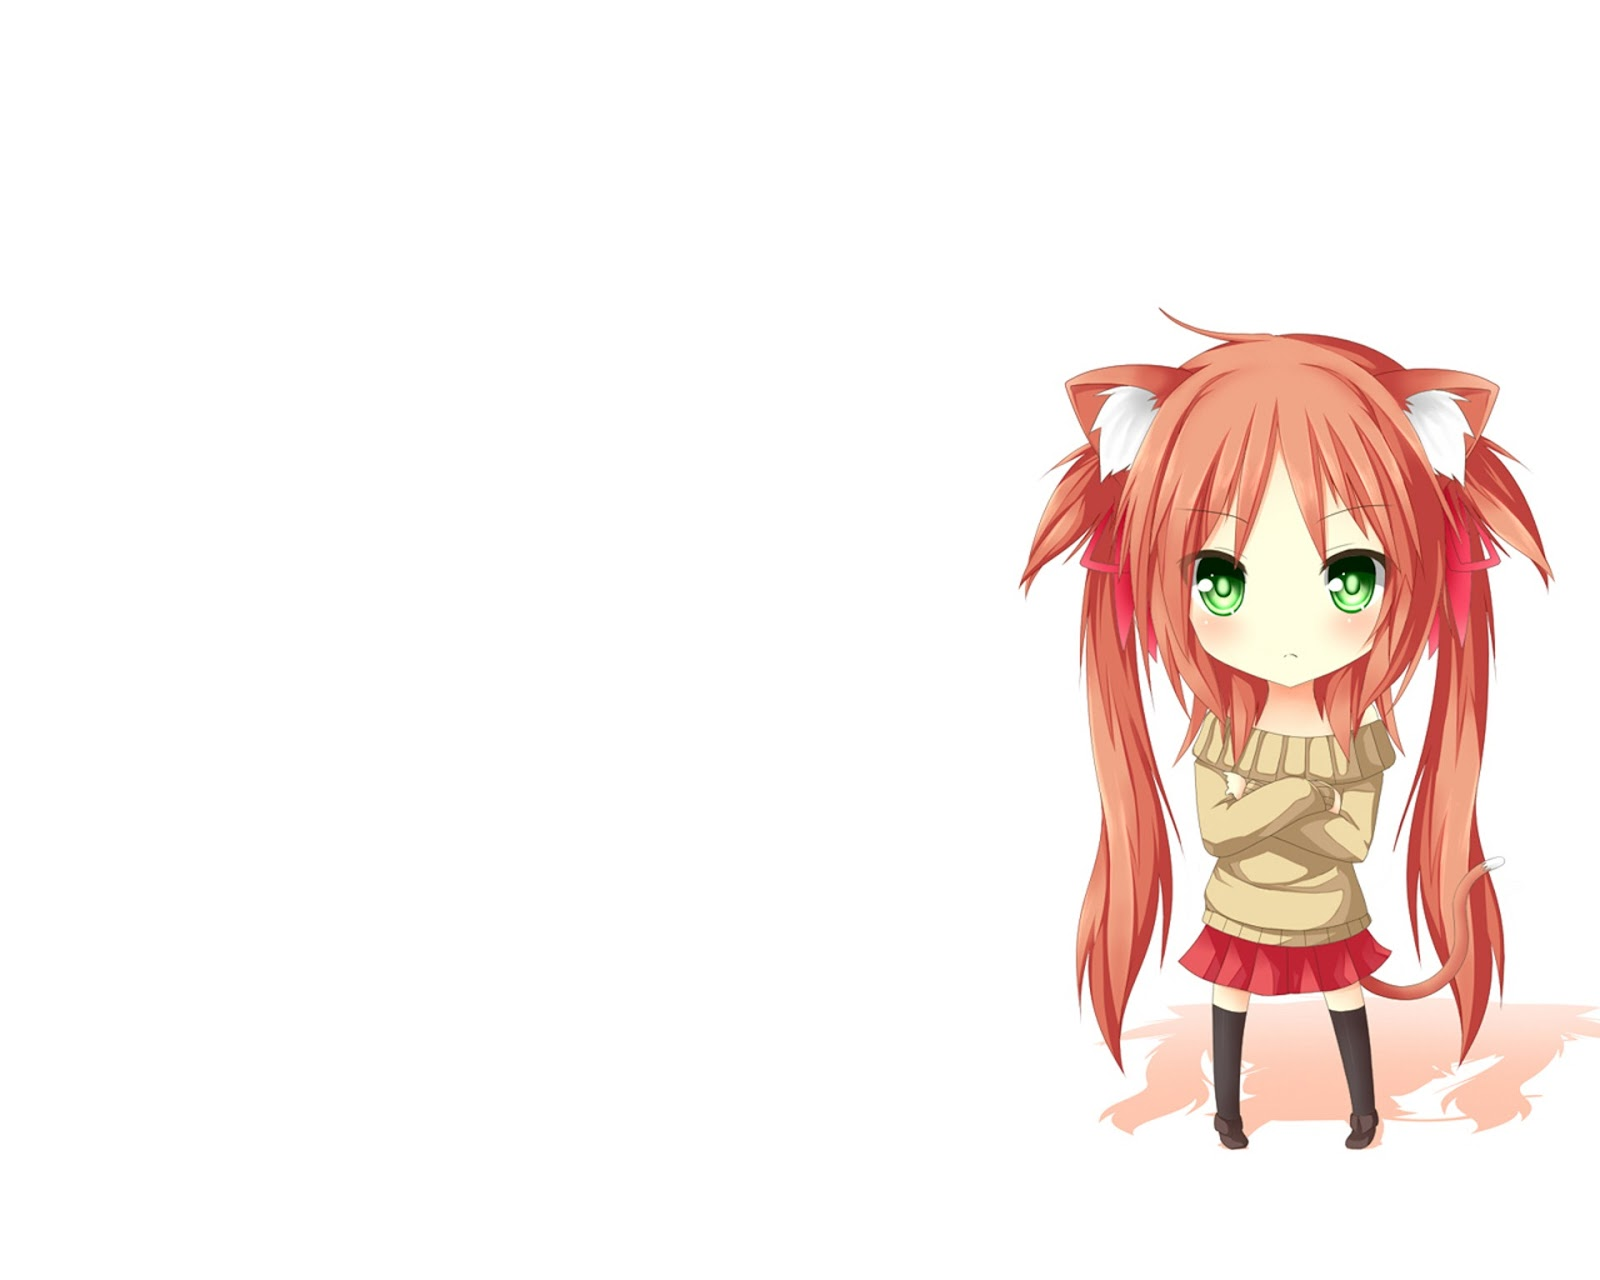 Chibi Vocaloid for Desktop wallpaper cute PNG file 1600x1280